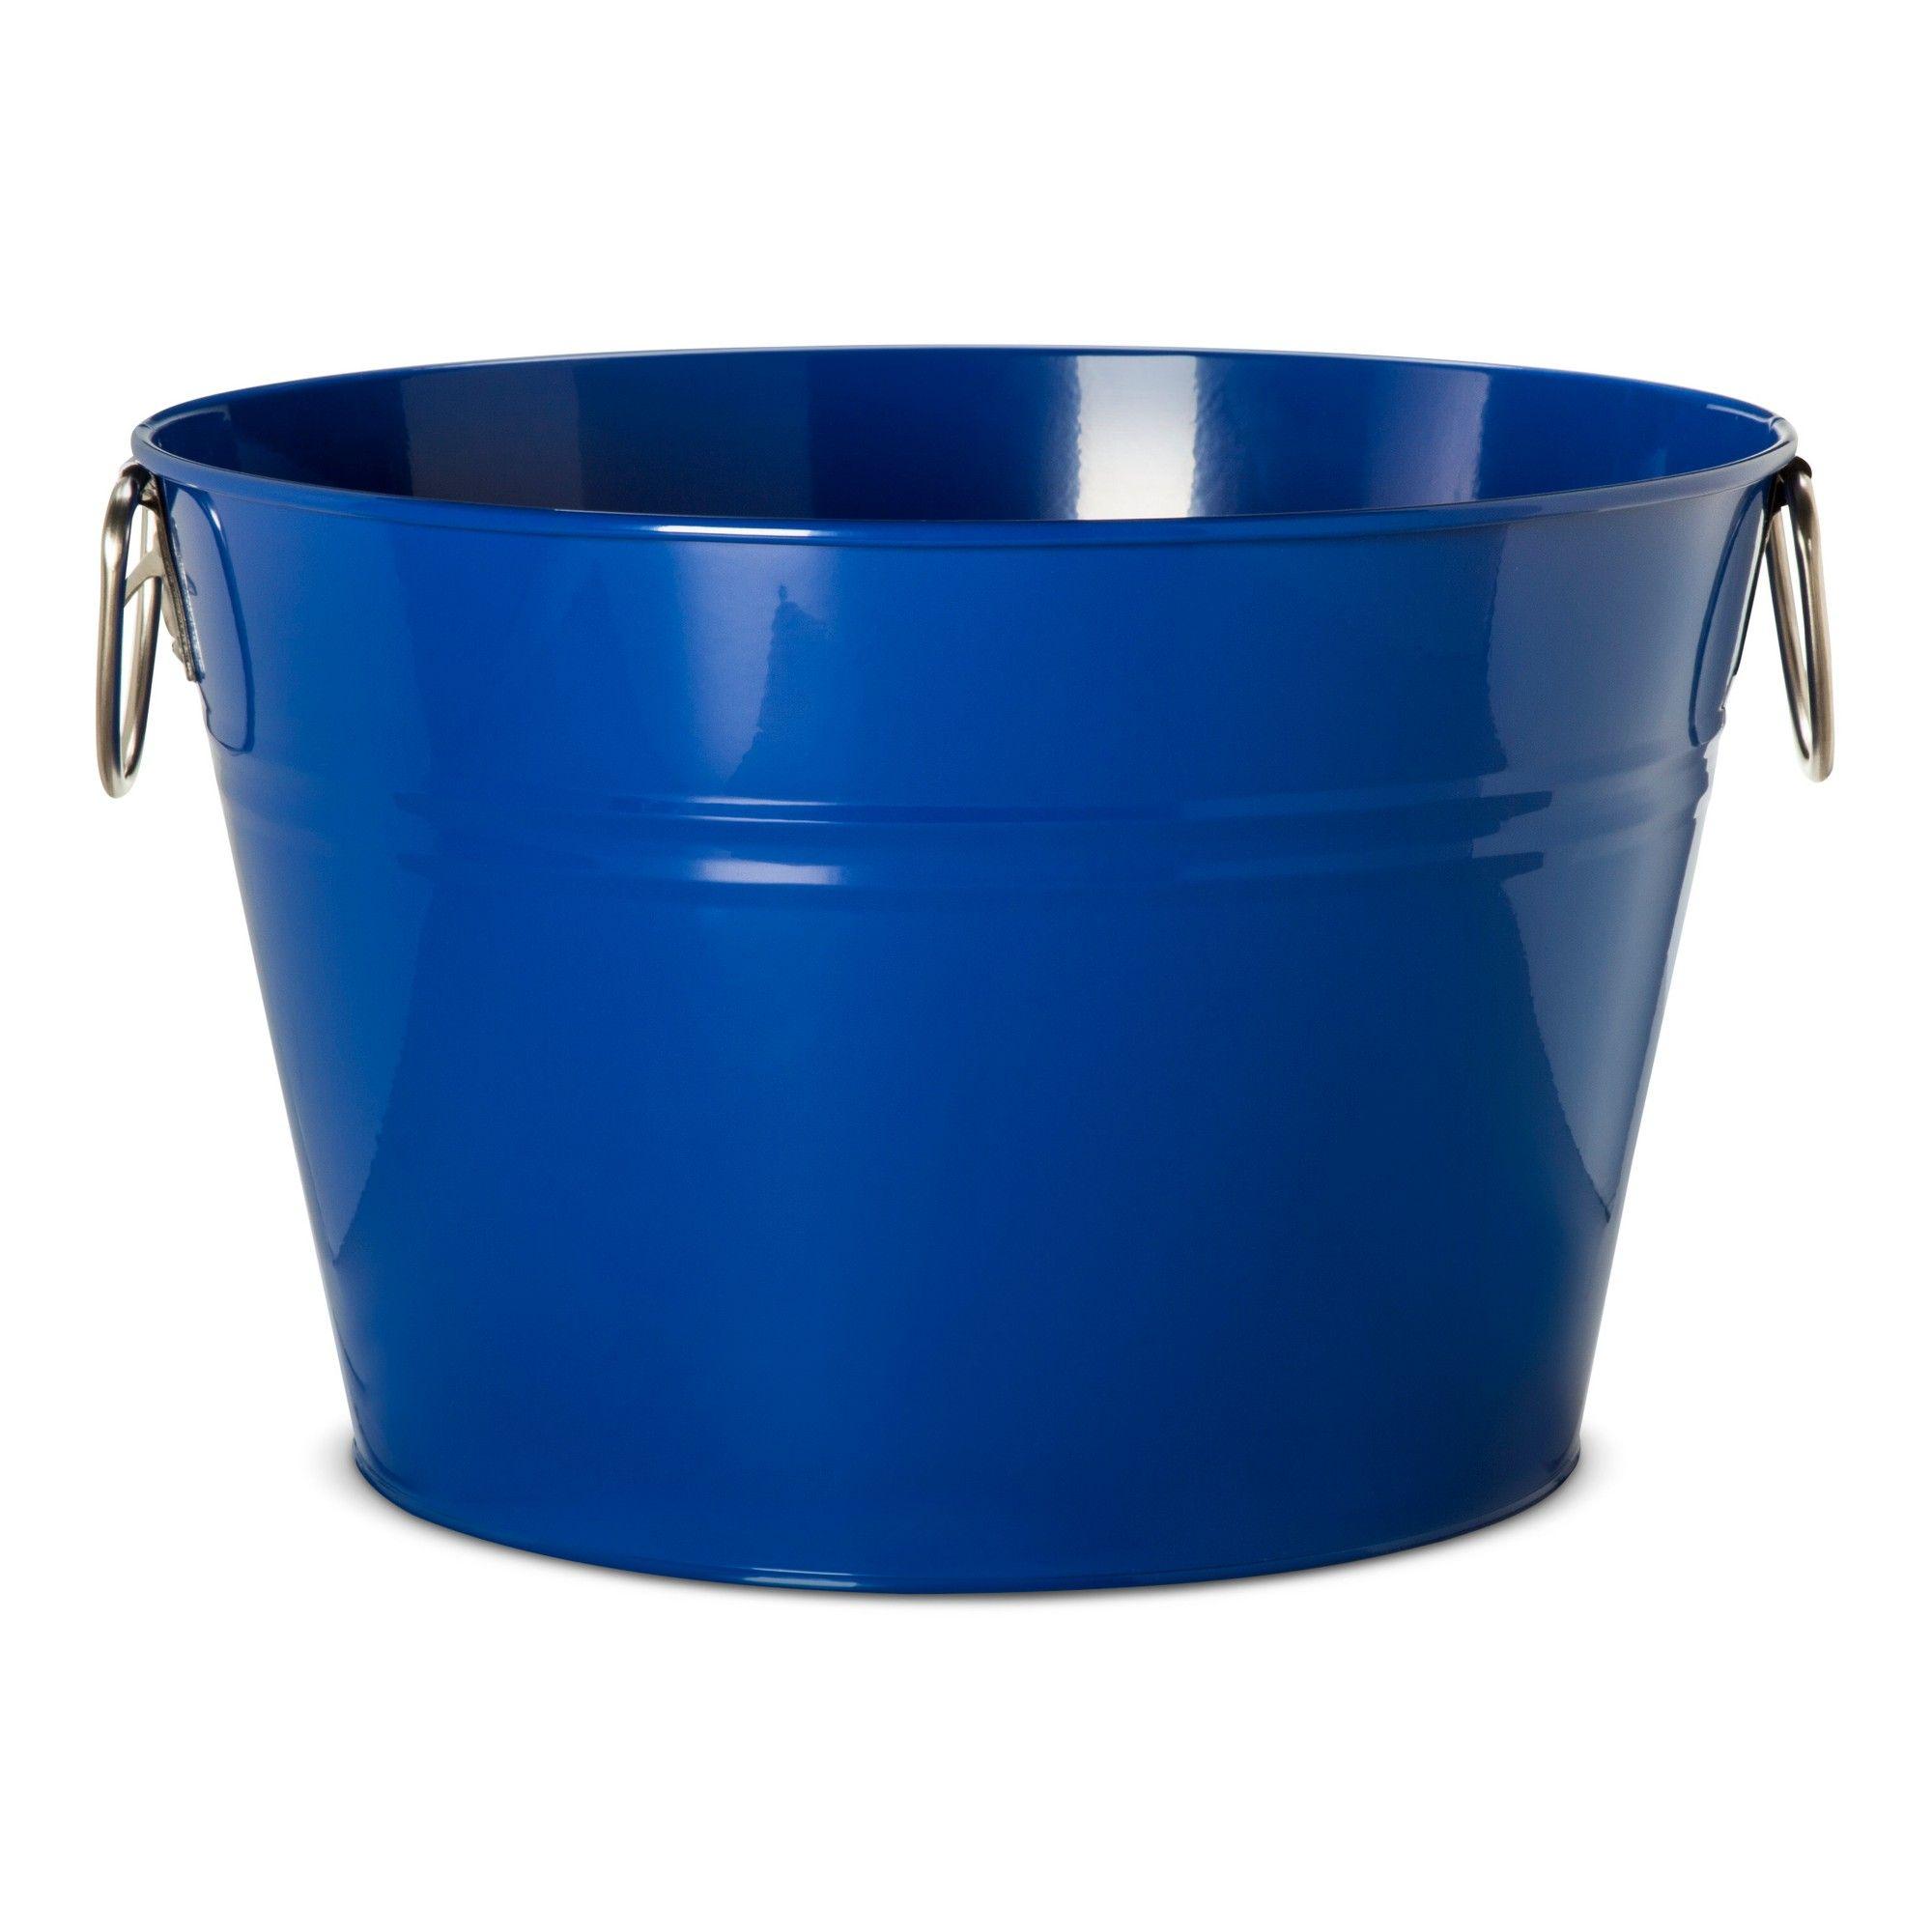 Large 6.3gal Steel Beverage Tub Blue   Tubs, Steel and Products